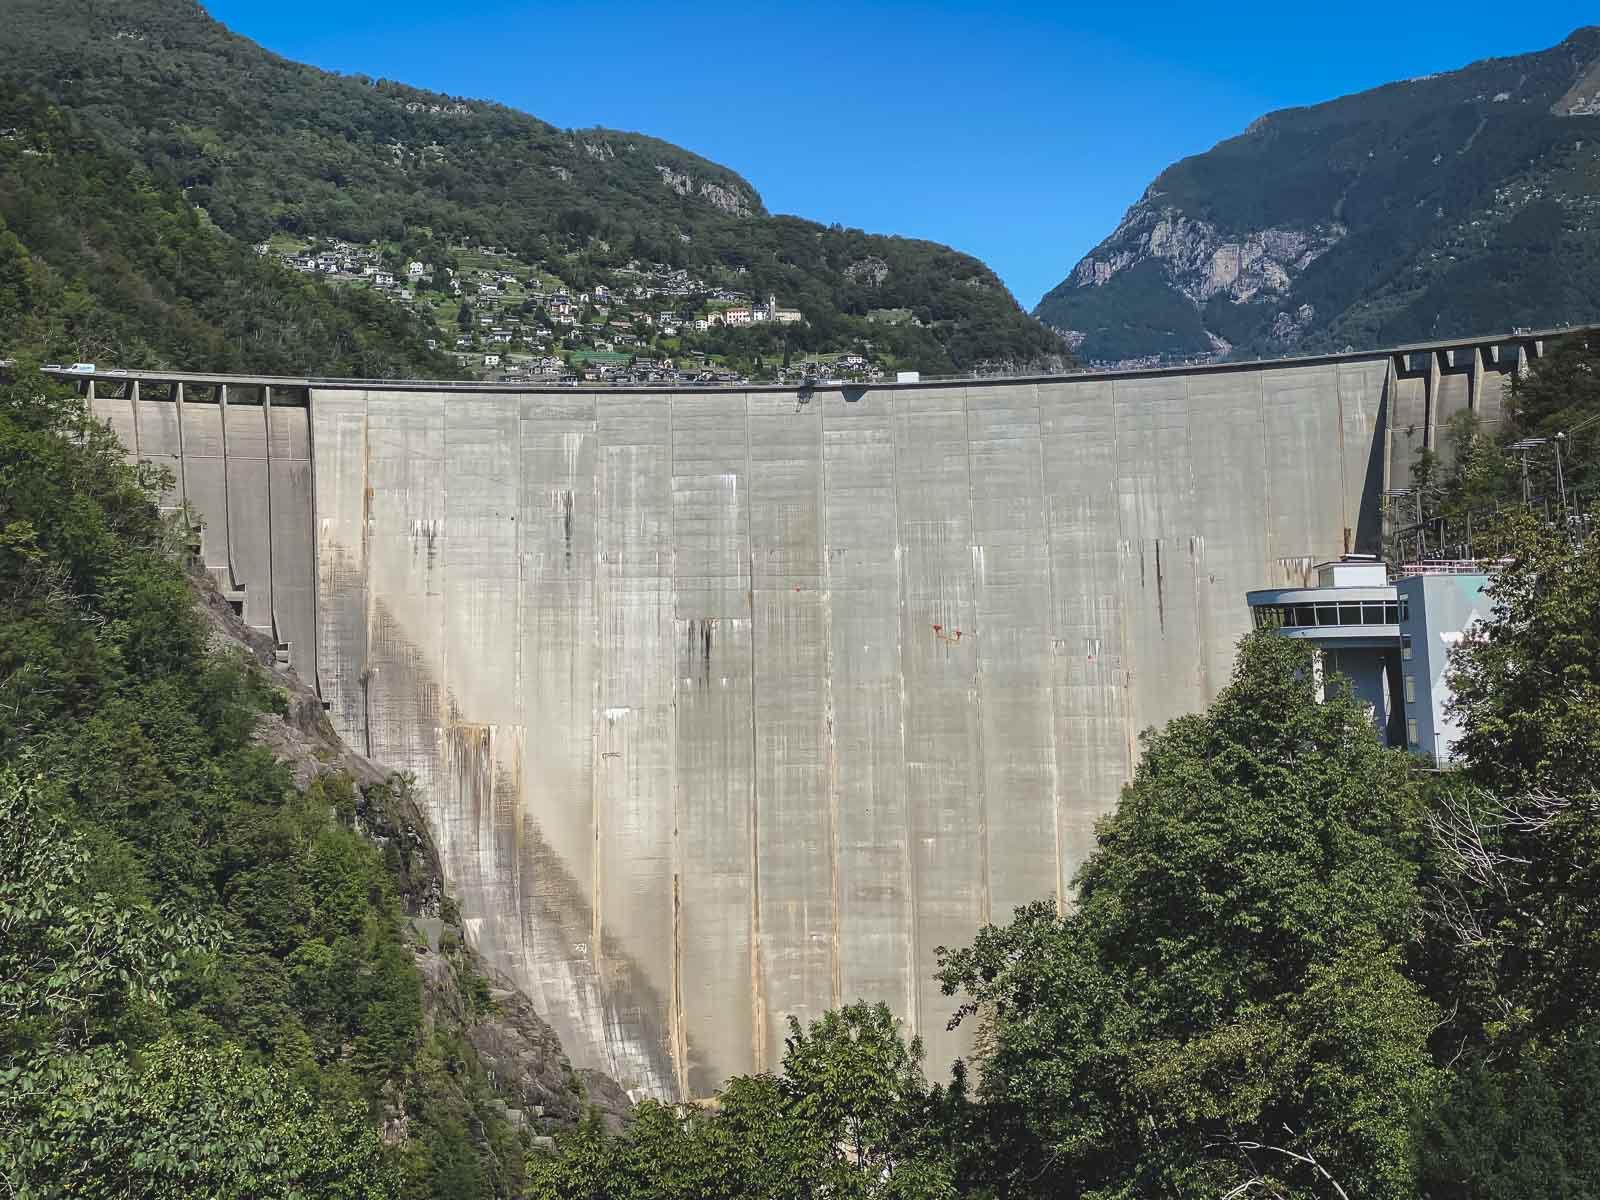 Visiting the Verzasca Dam in Ticino